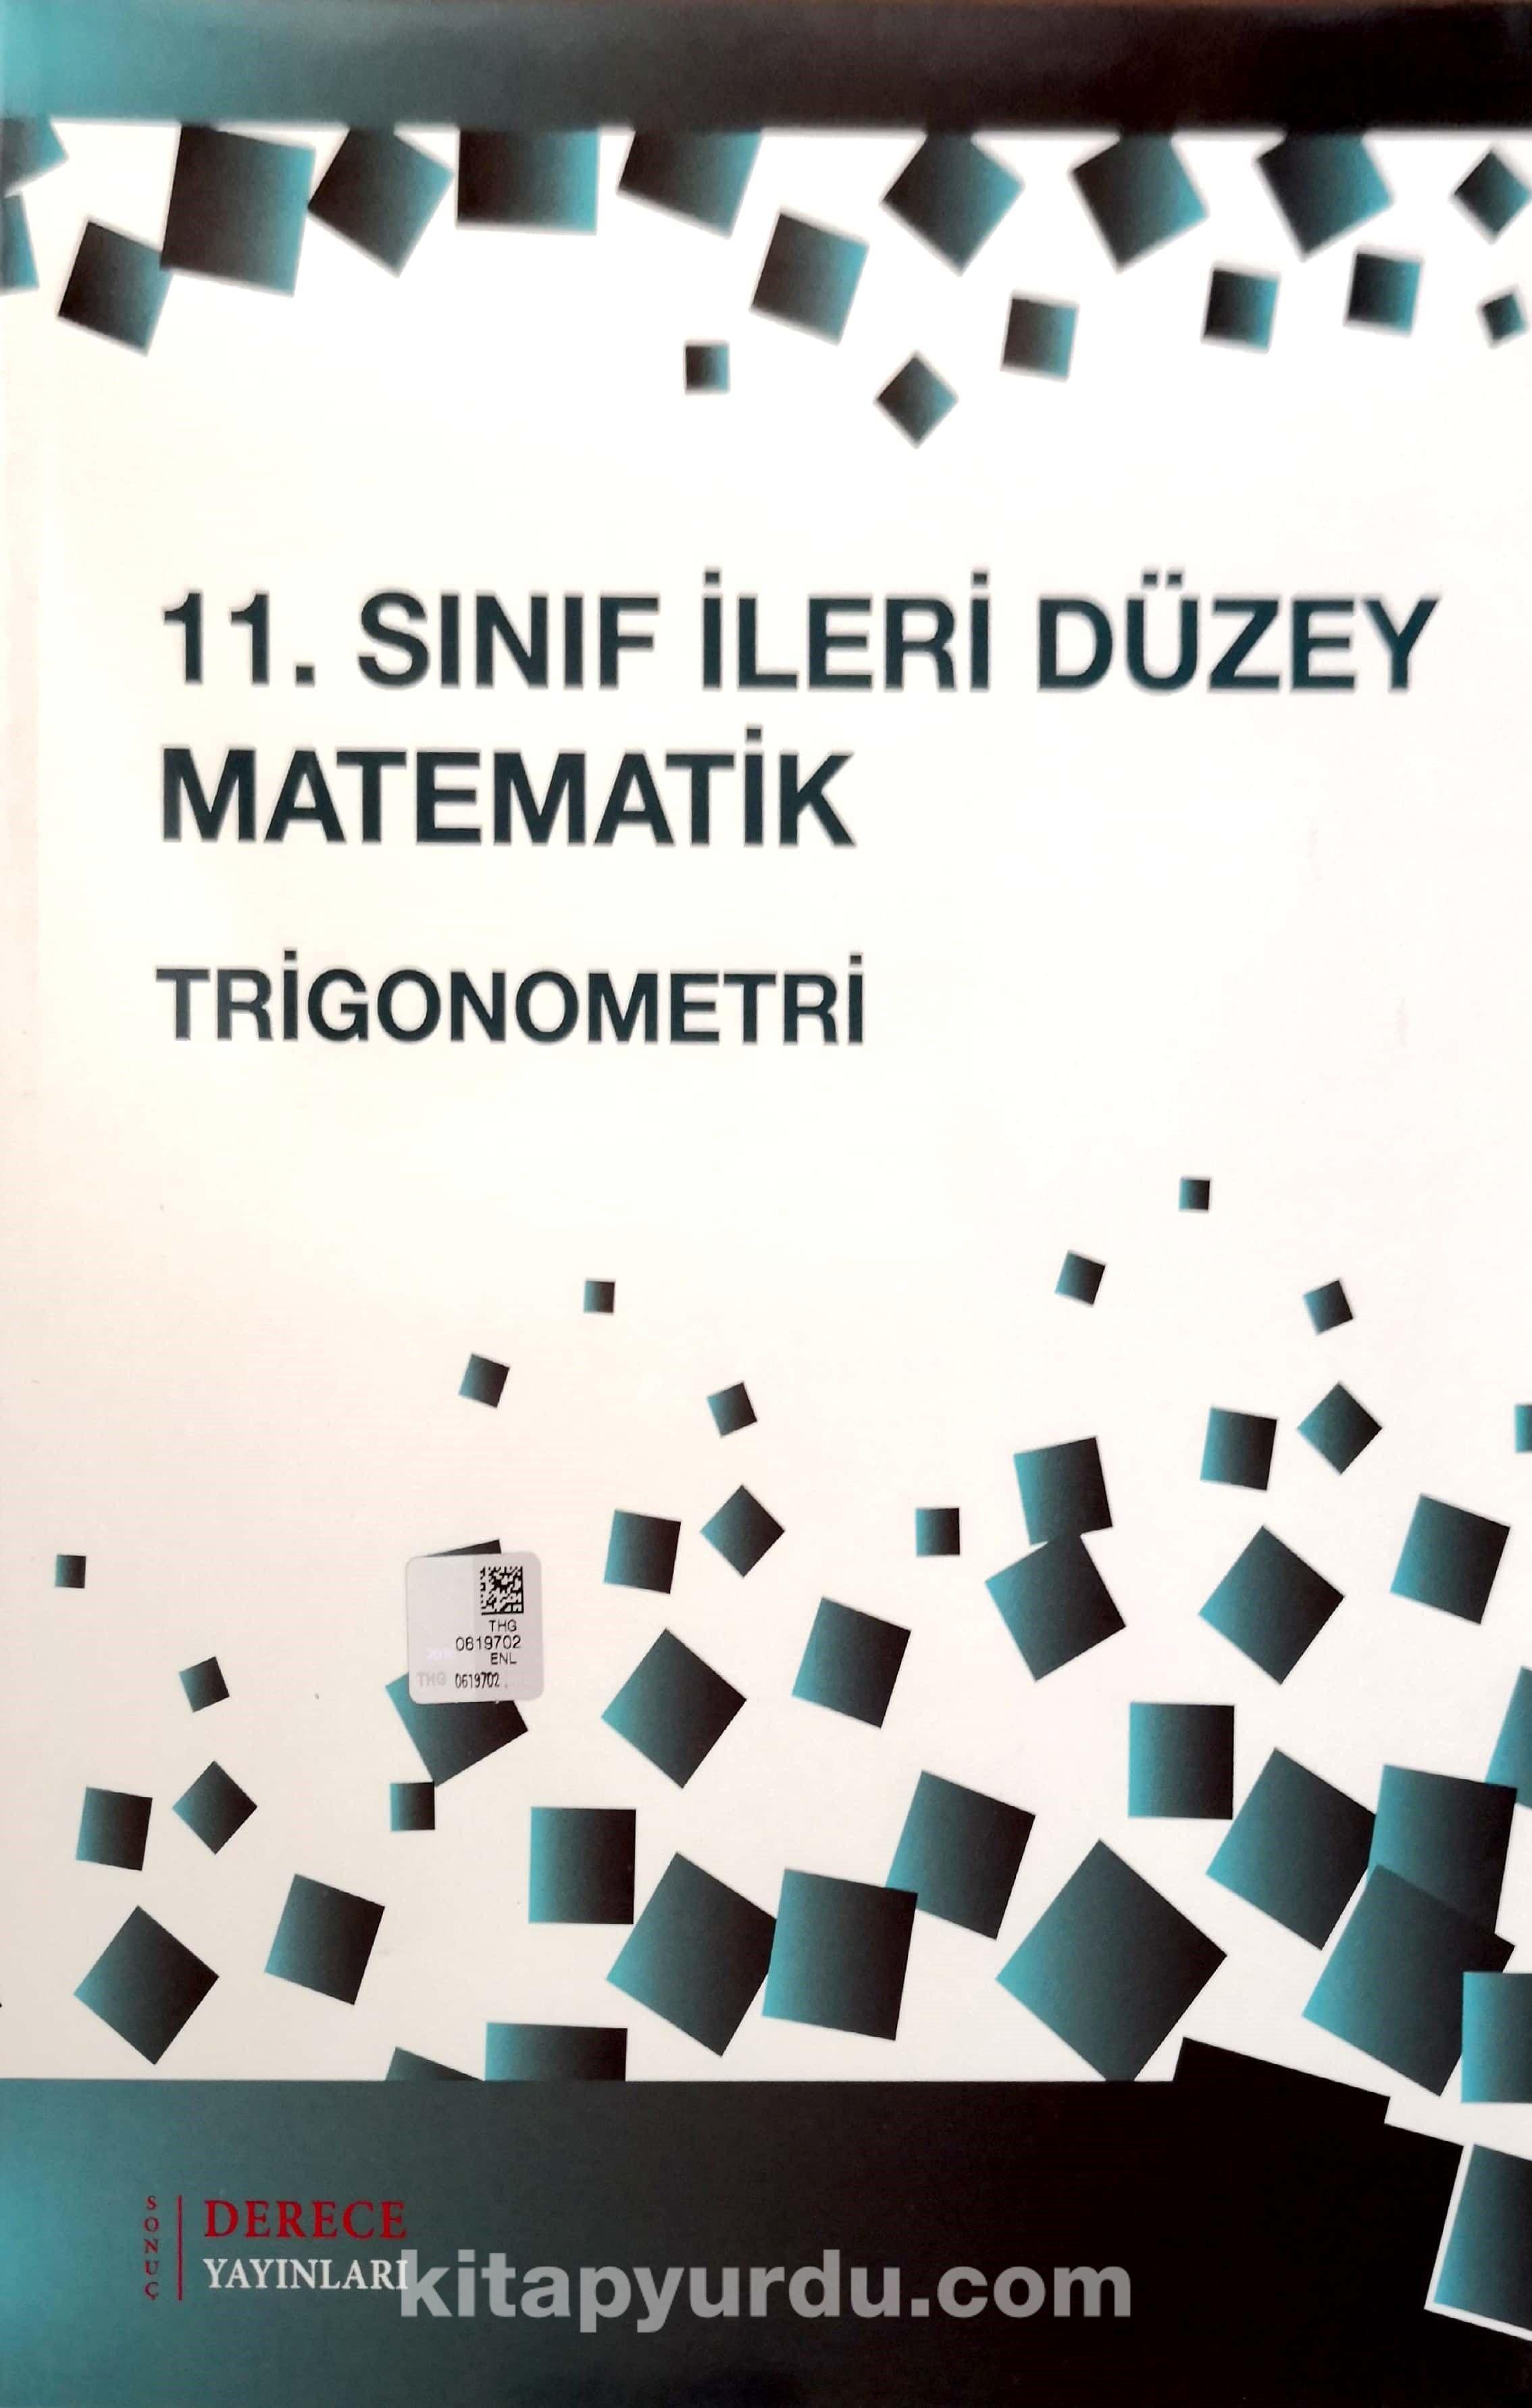 11. Sınıf İleri Düzey Matematik Trigonometri - Kollektif pdf epub